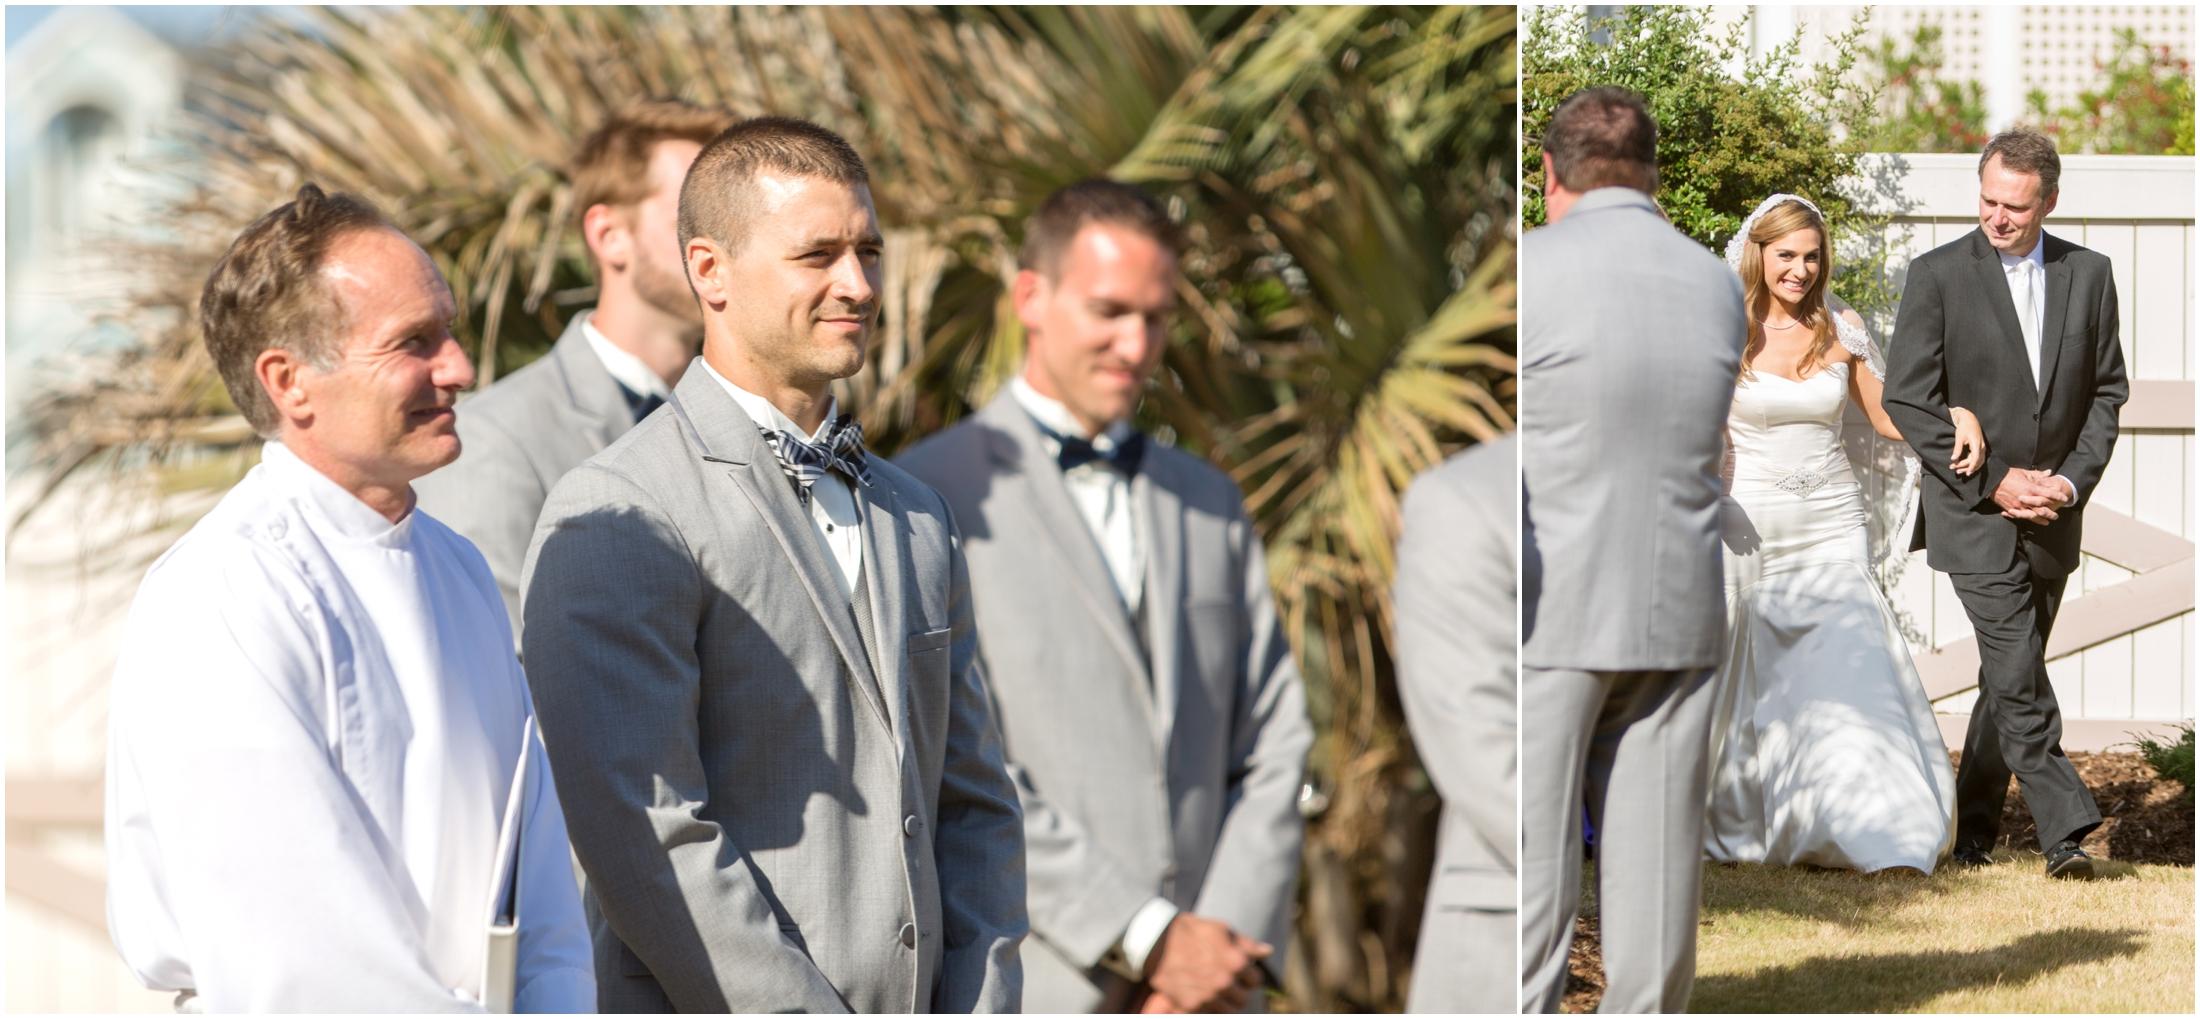 Pearce-Wedding-Ceremony-384.jpg